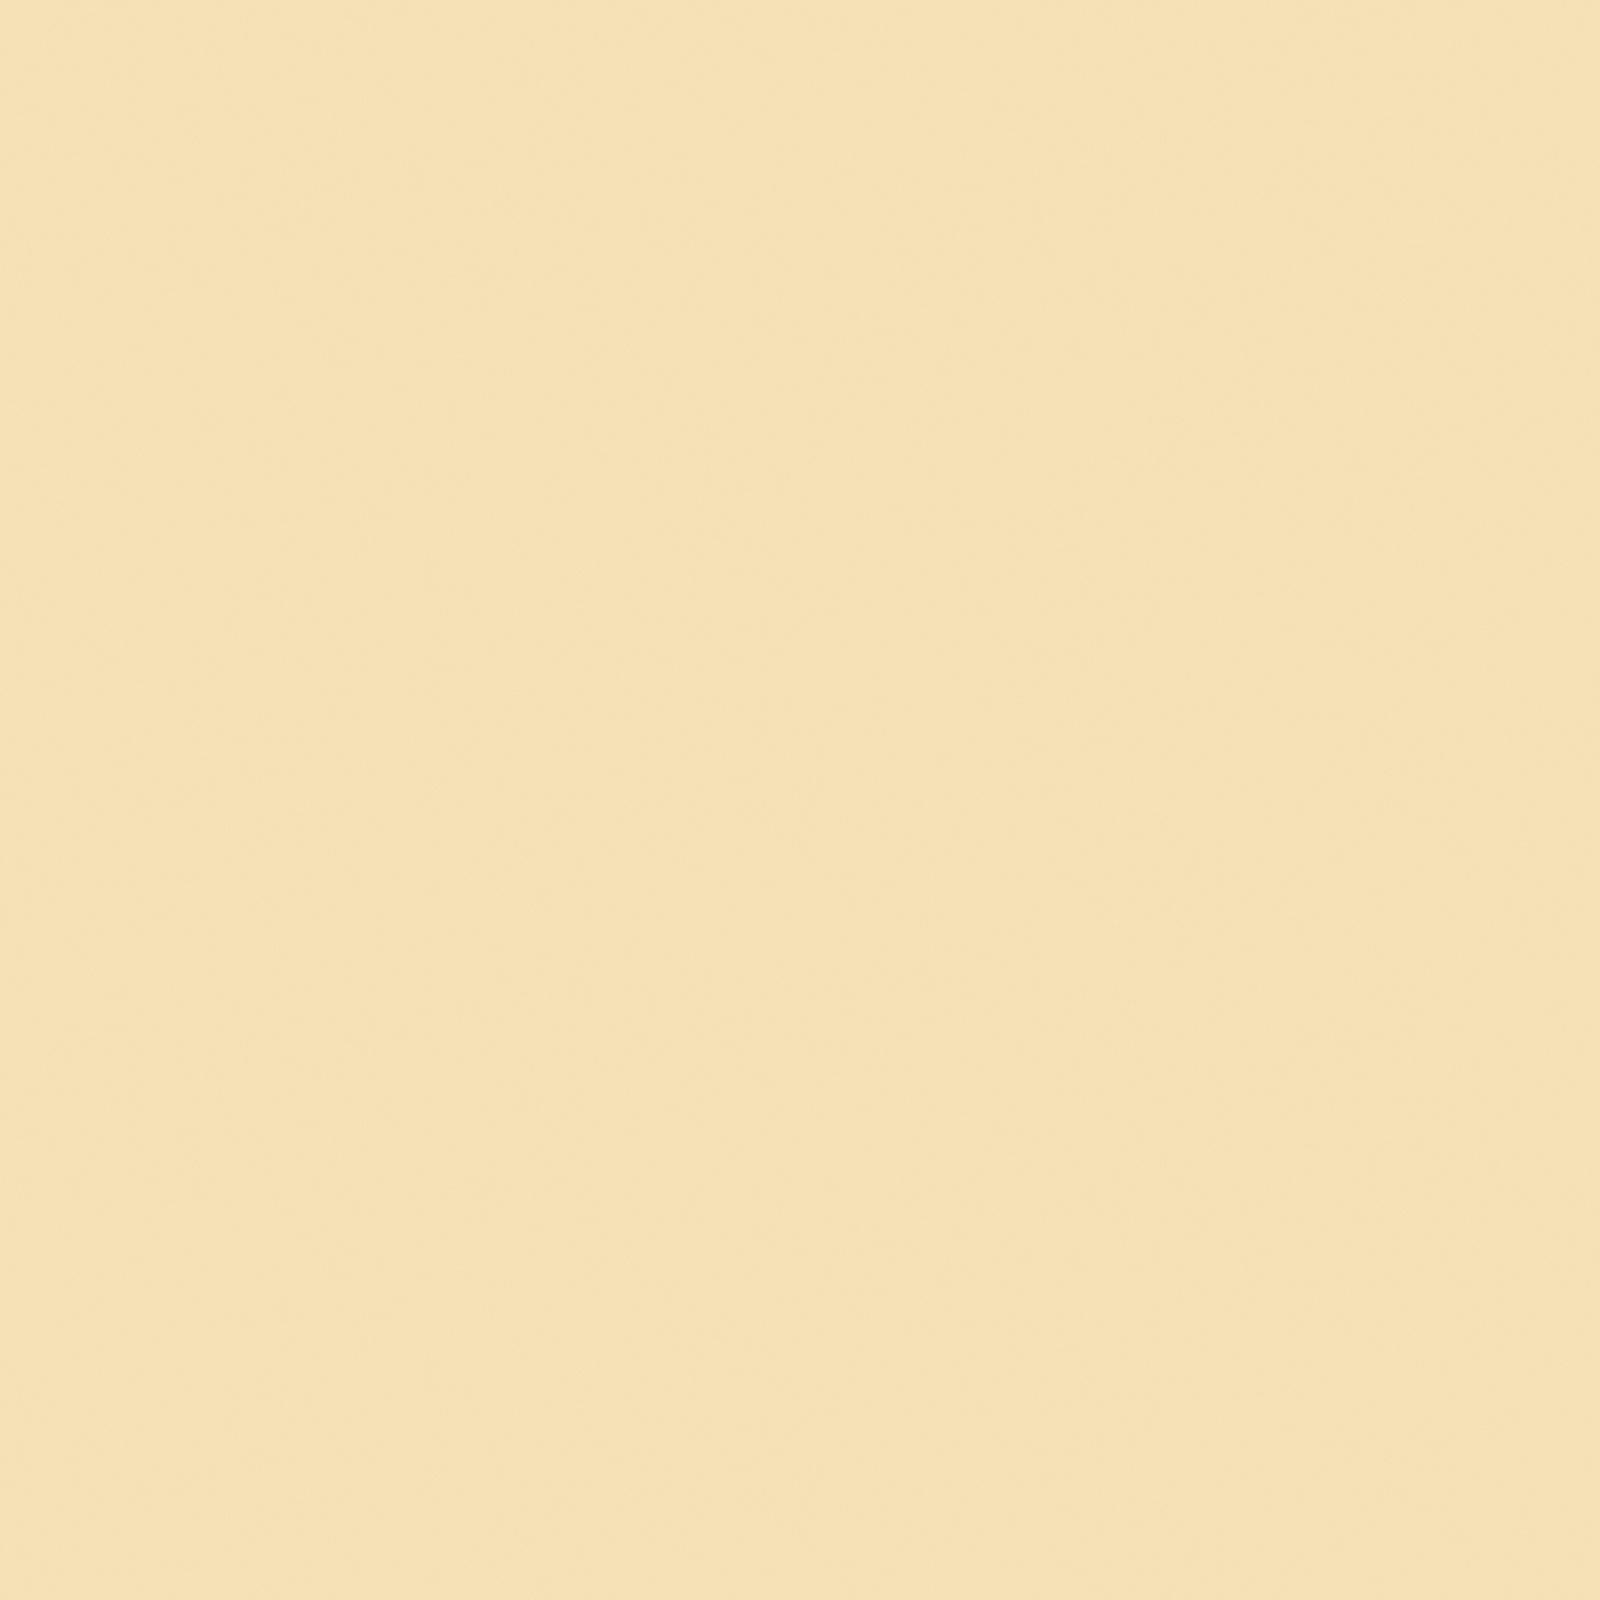 Peach Crem-Smoothie Cardstk 12